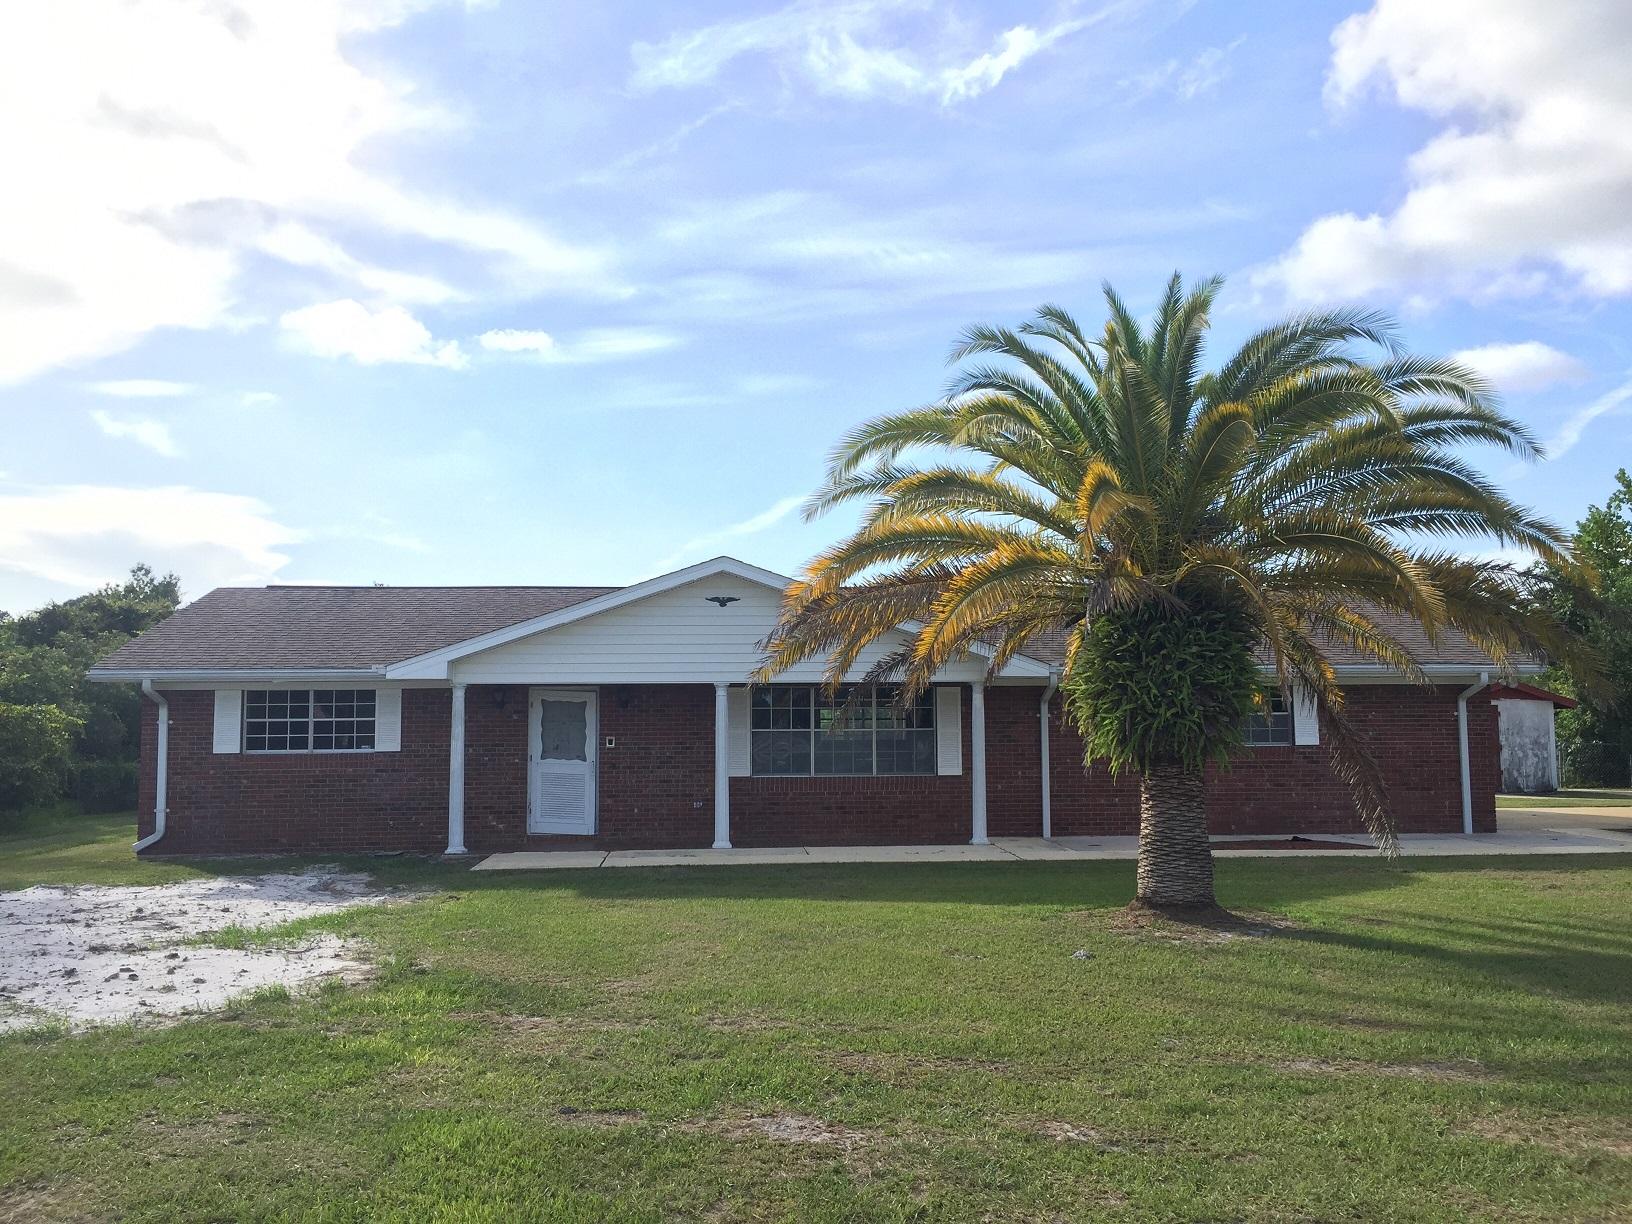 Susan Logan, Realtor – New Smyrna Beach, Samsula homes & land for